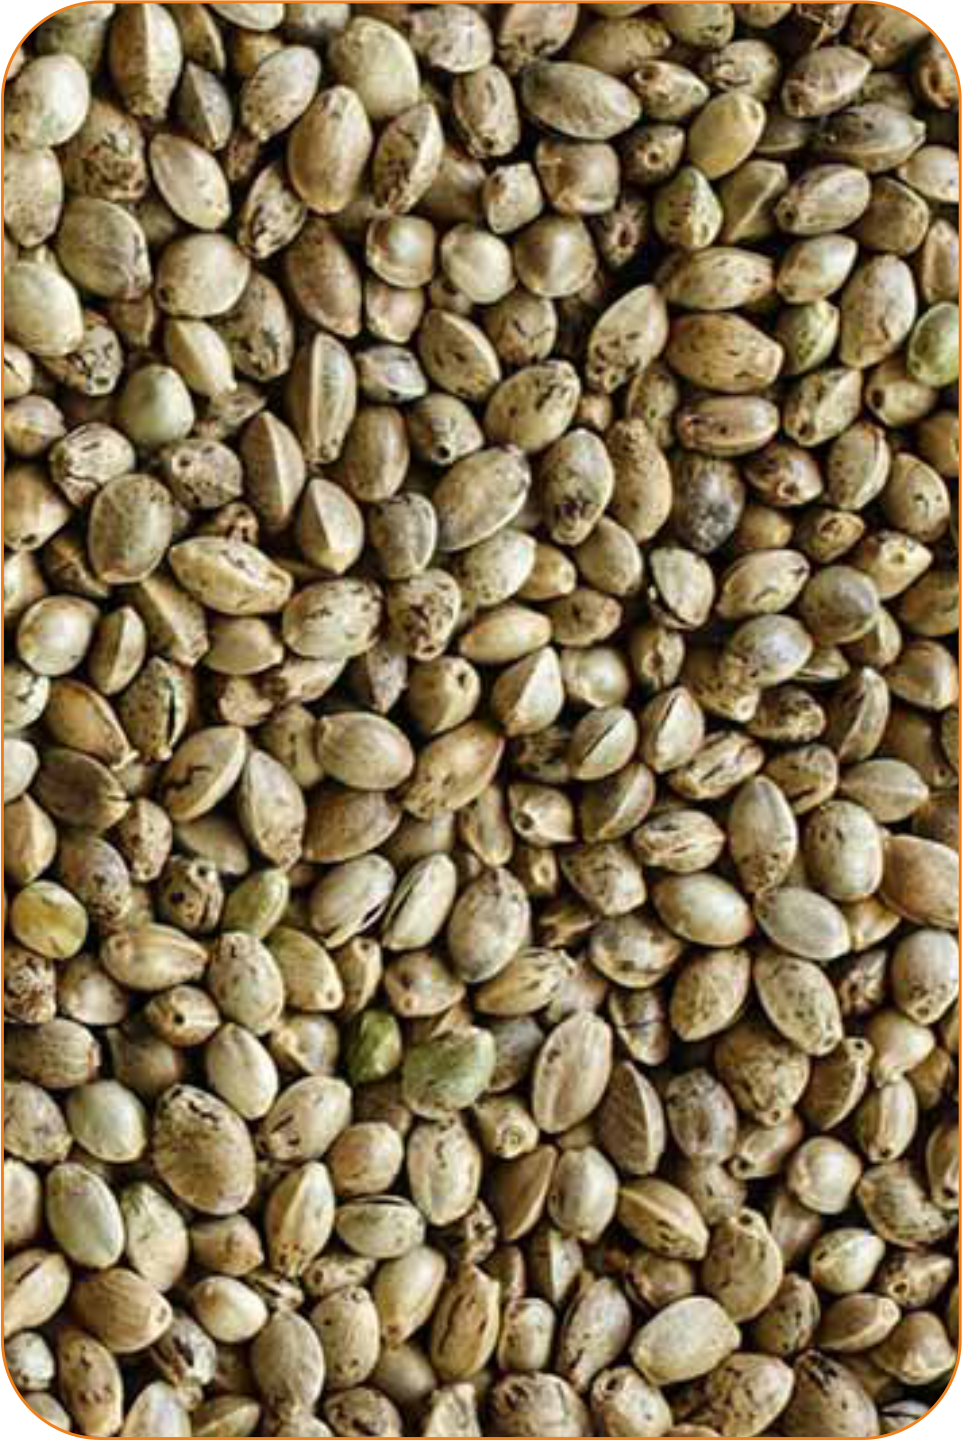 Konopné semínko suché 0,5 kg